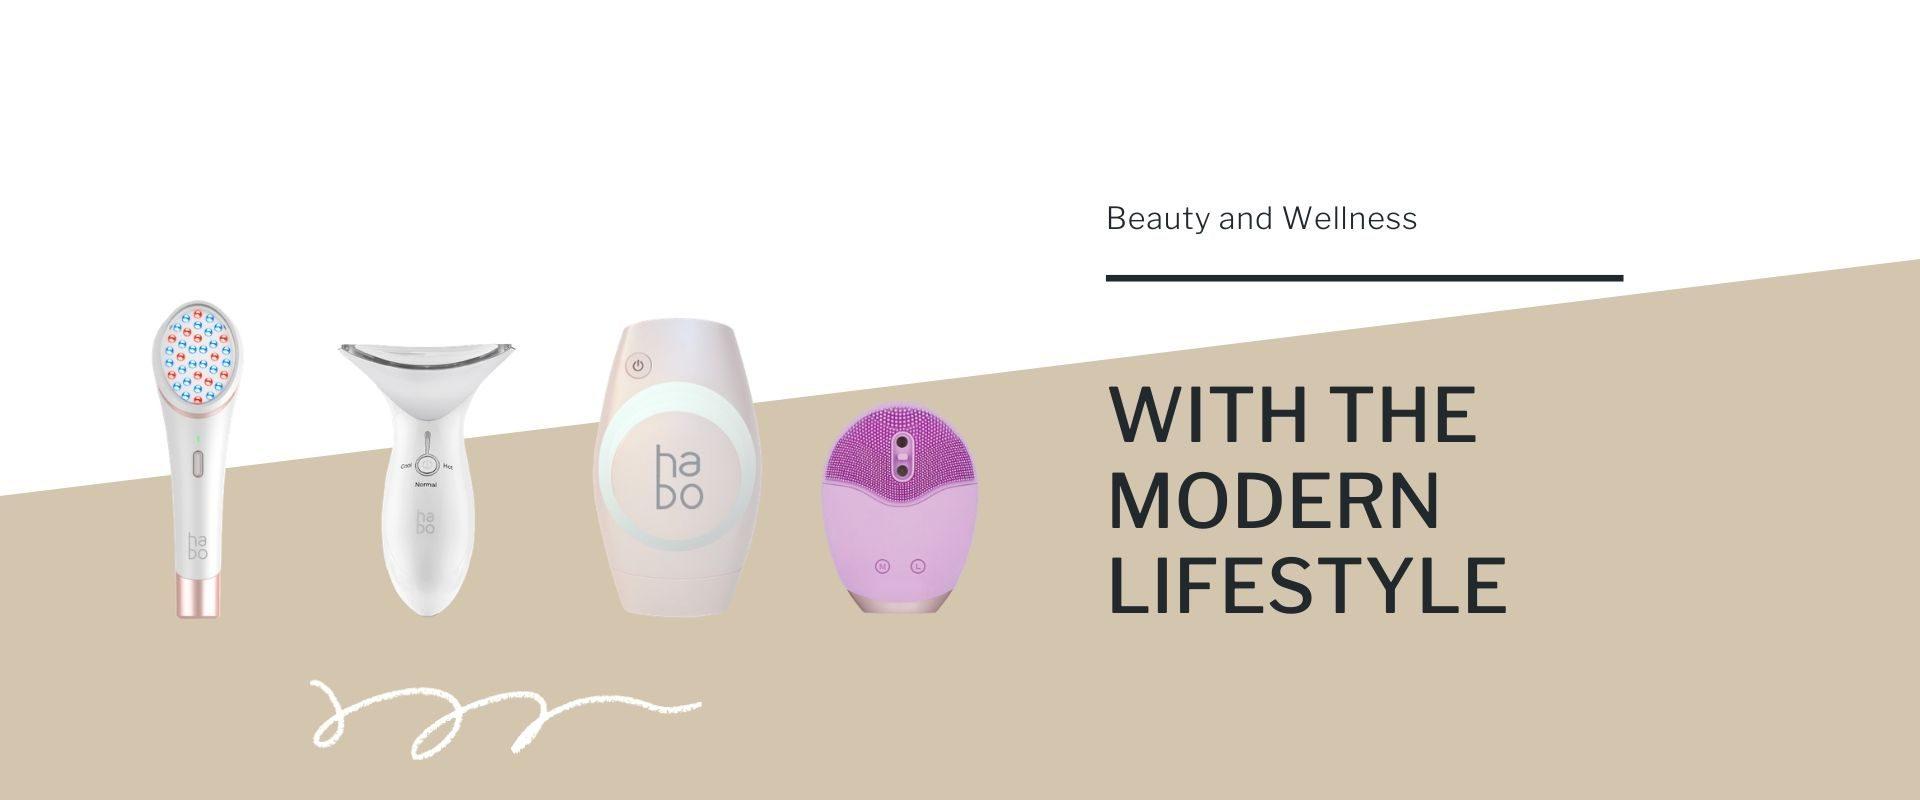 health and beauty 1 (1)